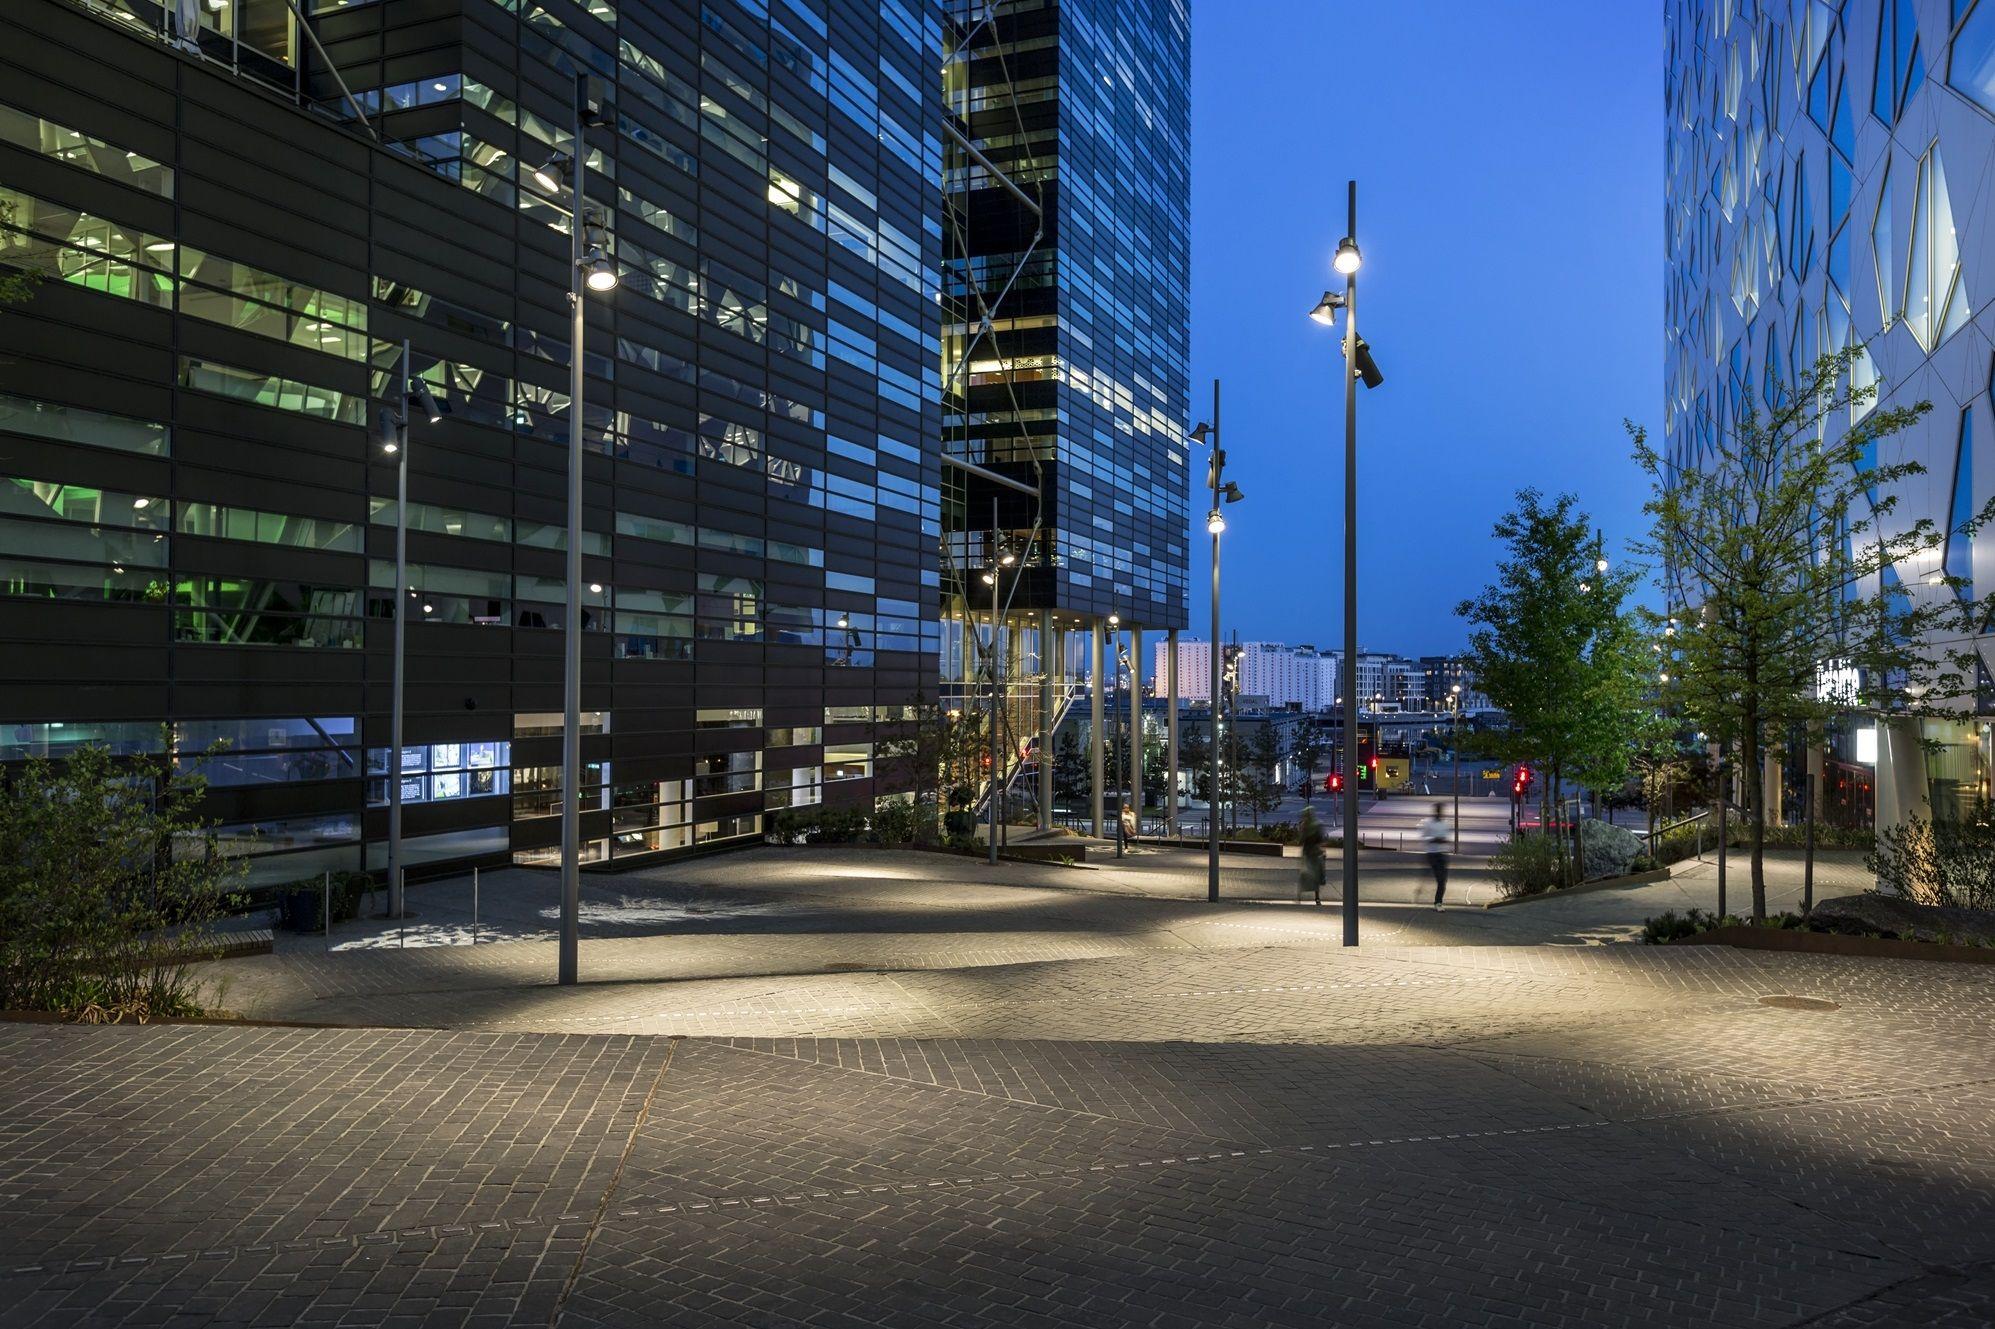 Stasjonsalmenningen – Oslo, Norway - Client: Bjørvika Infrastruktur AS - Lighting project: SLA - Photo: Tomasz Majewski – Lighting products: Maxiwoody by iGuzzini Illuminazione #iGuzzini #Lighting #Light #Luce #Lumière #Licht